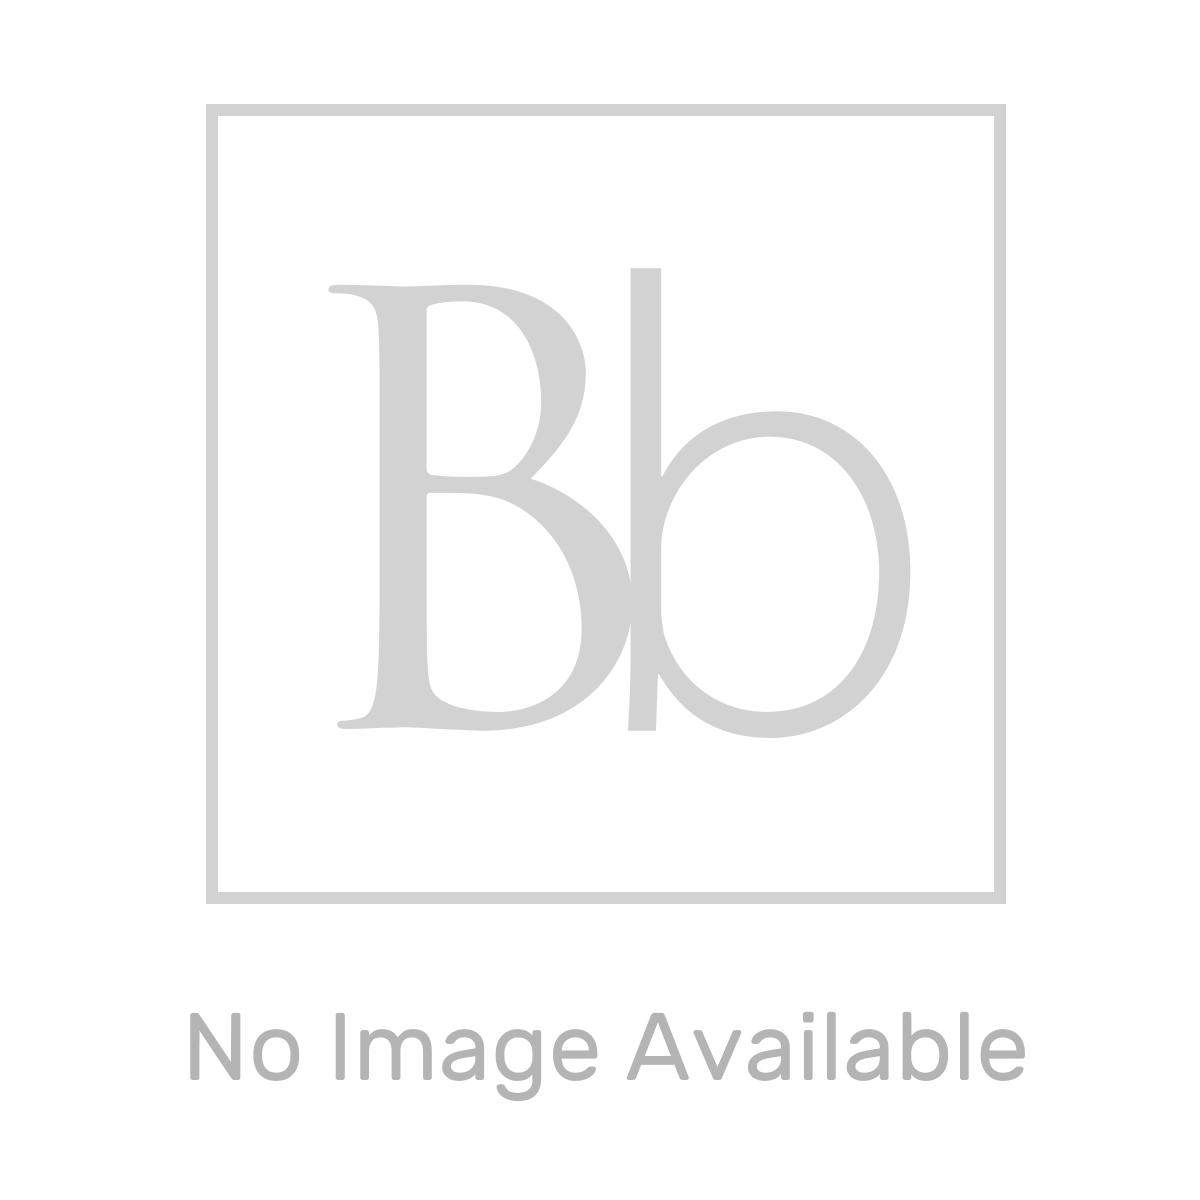 Kartell K-vit White Tetris L Shaped Right Hand Bath with Leg Sets 1700mm